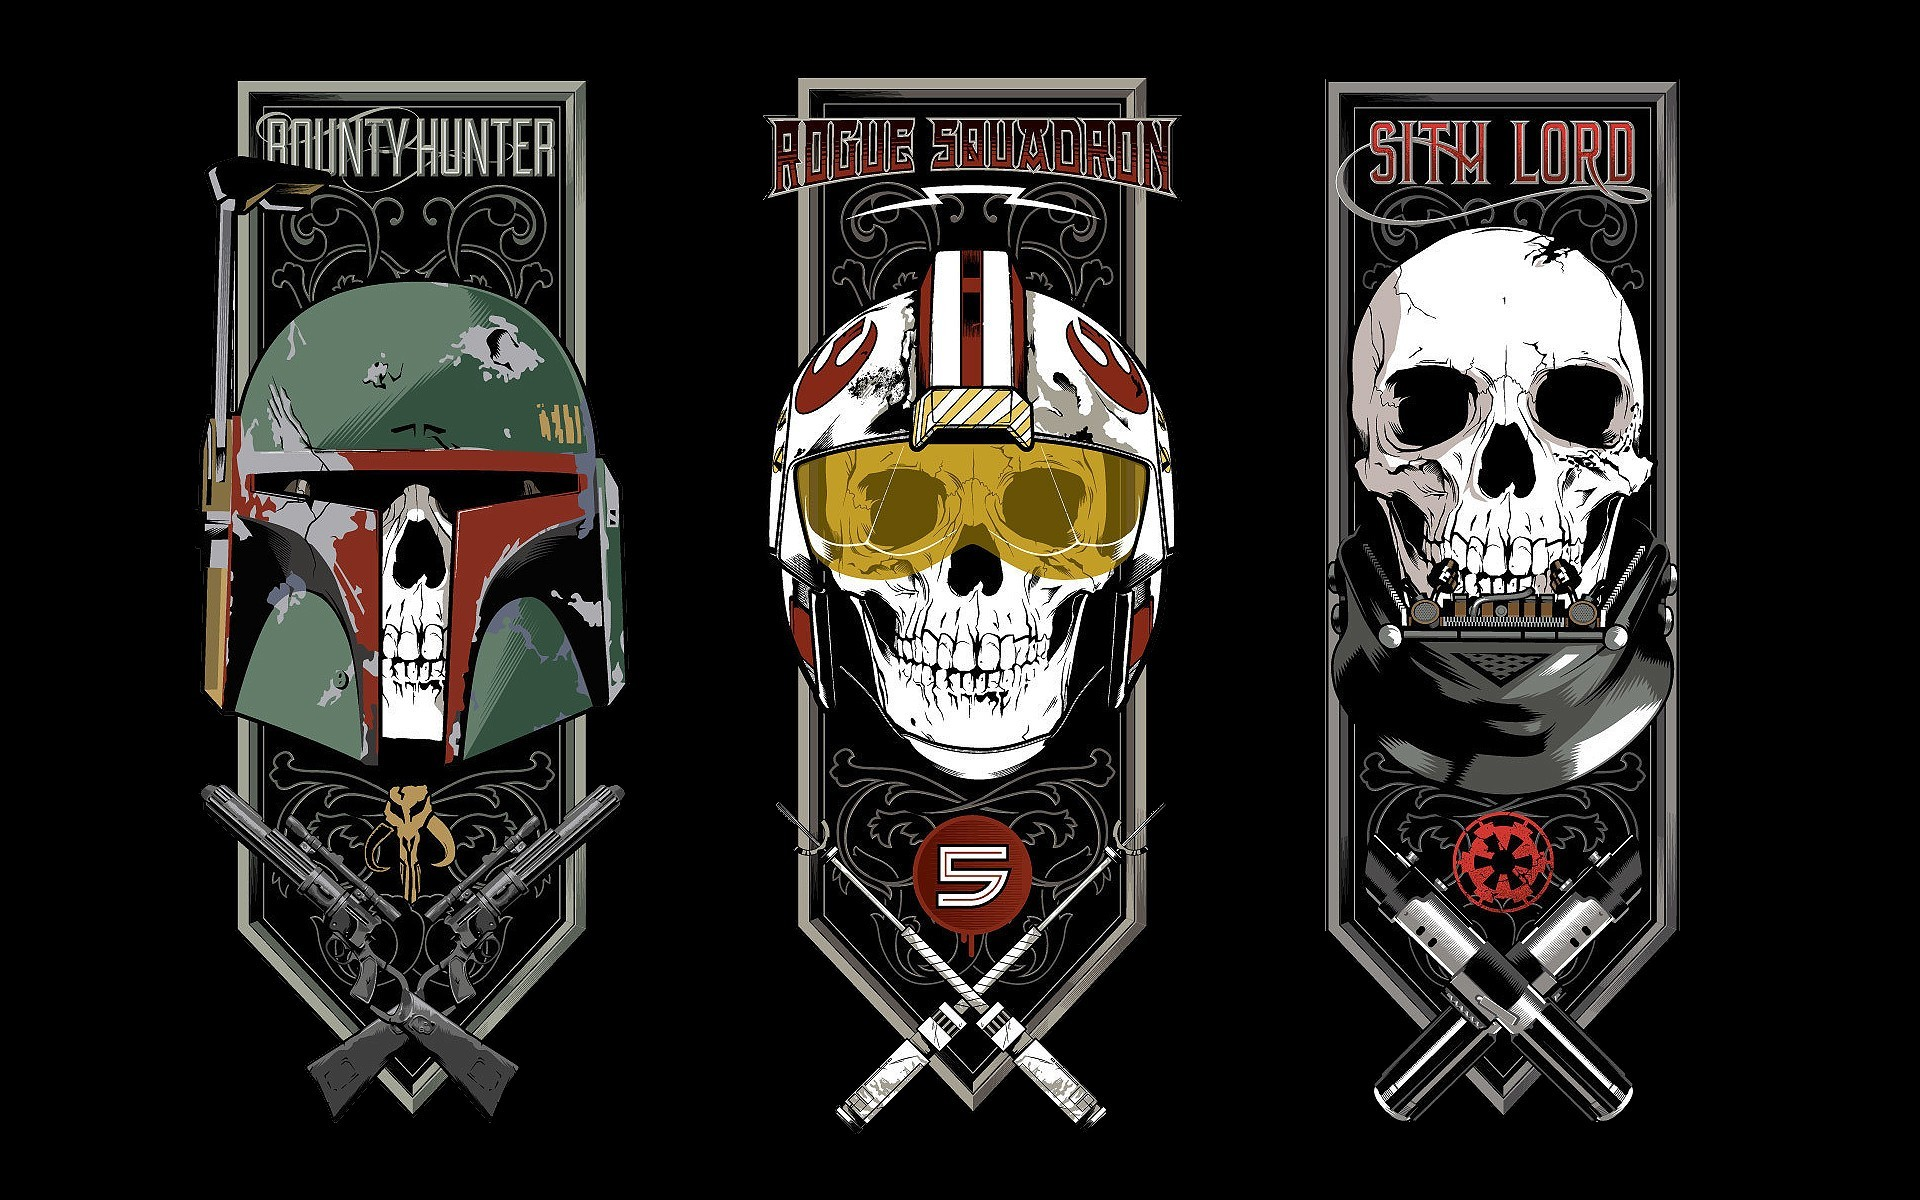 Star Wars Wallpaper Dump : StarWars